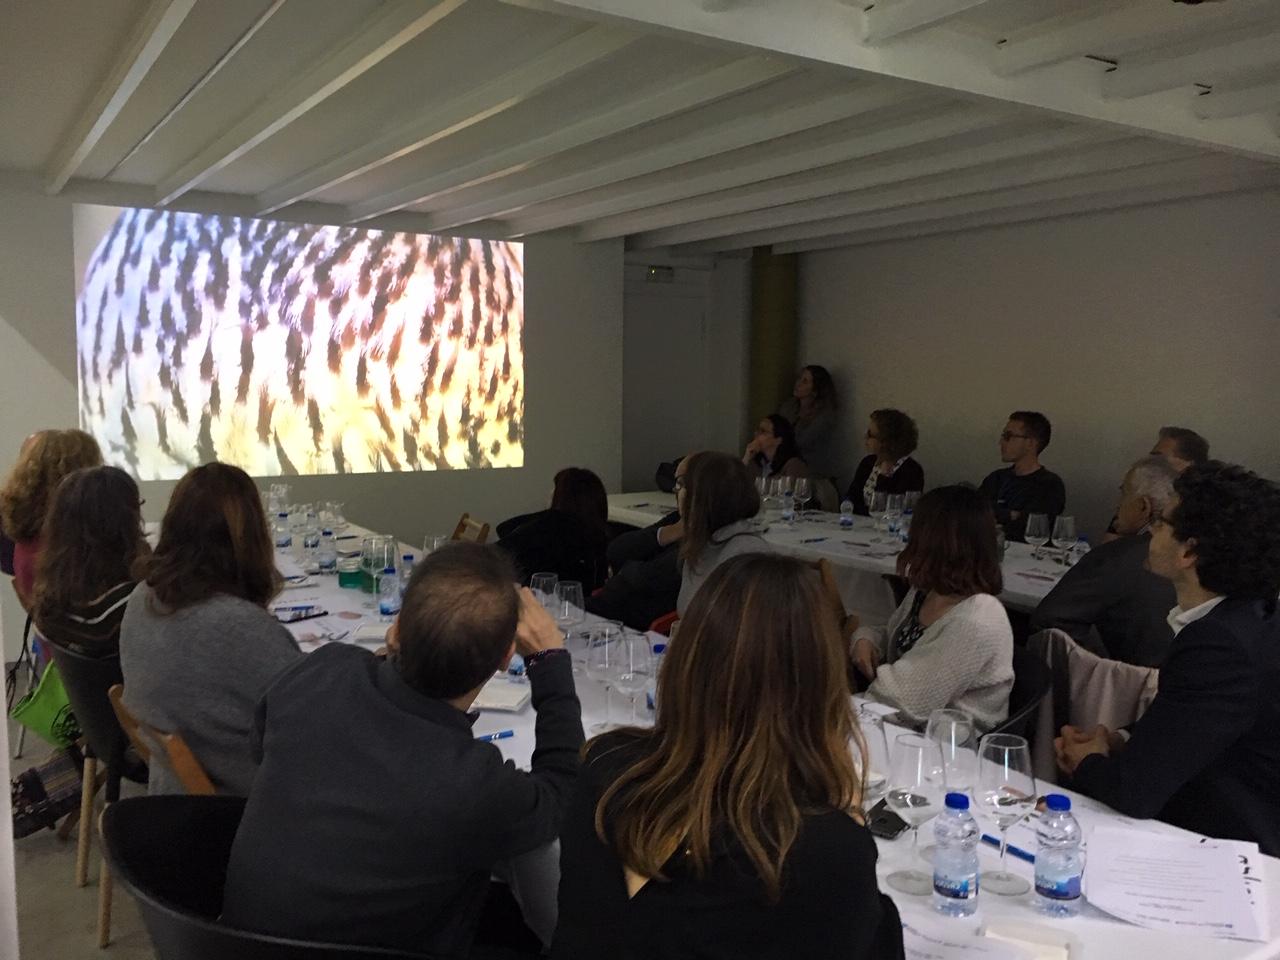 espacio para eventos gastronómicos en Vigo